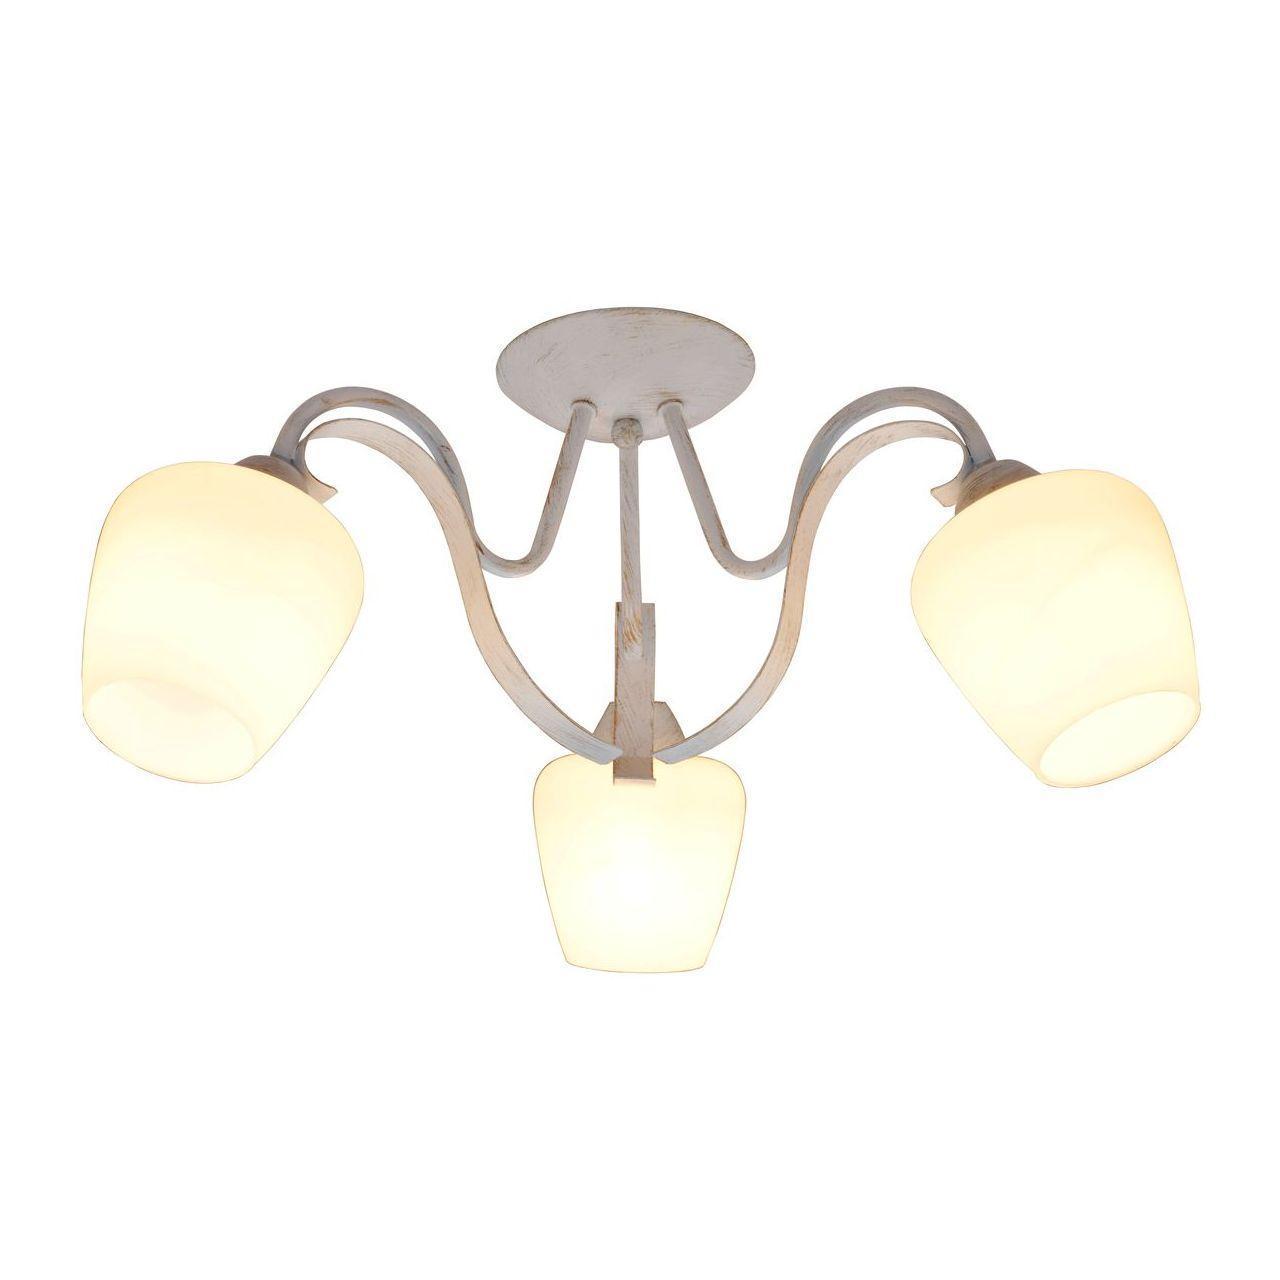 Люстра Toplight Abegail TL1133-3D потолочная люстра toplight abegail tl1133 3d